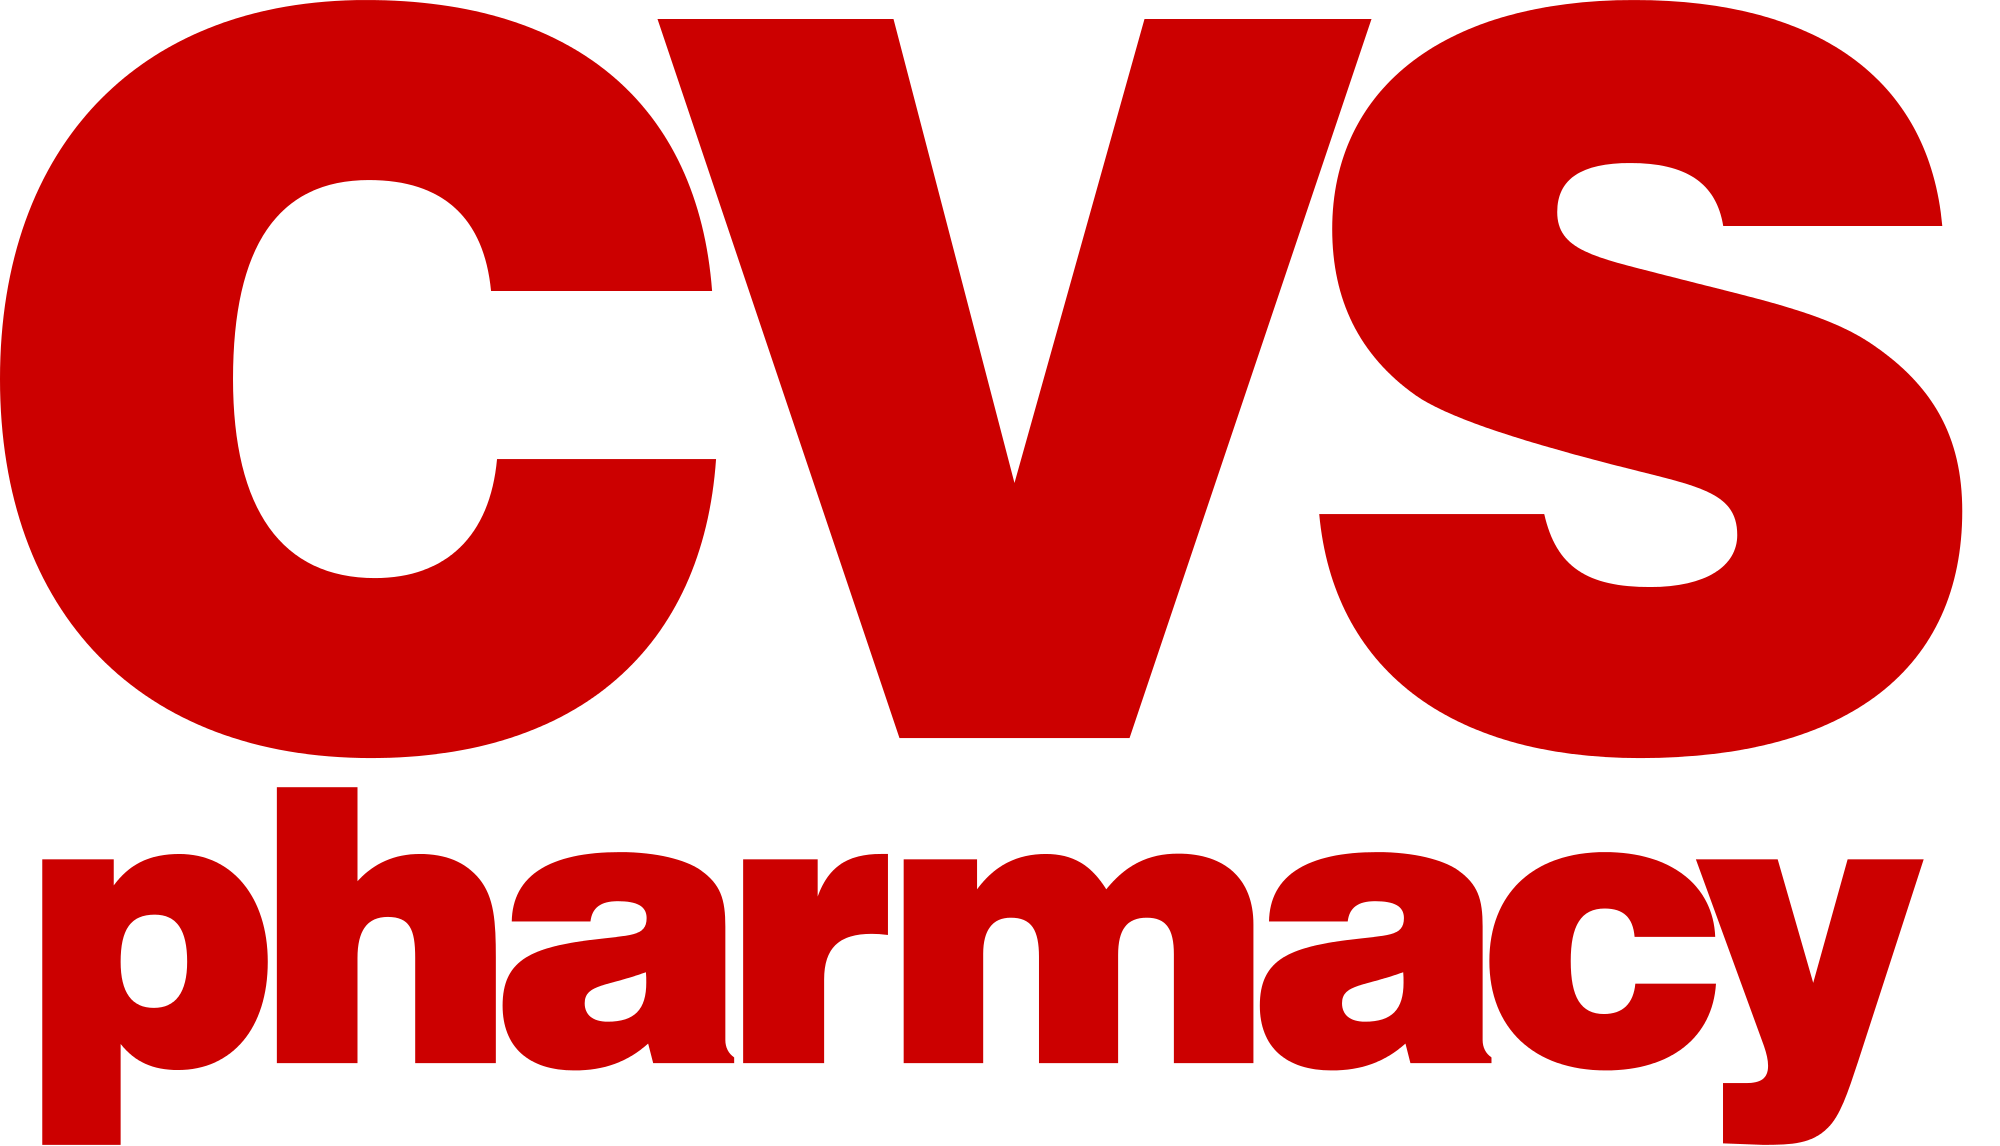 CVS Deal汇总 (07/16/17-07/22/17)